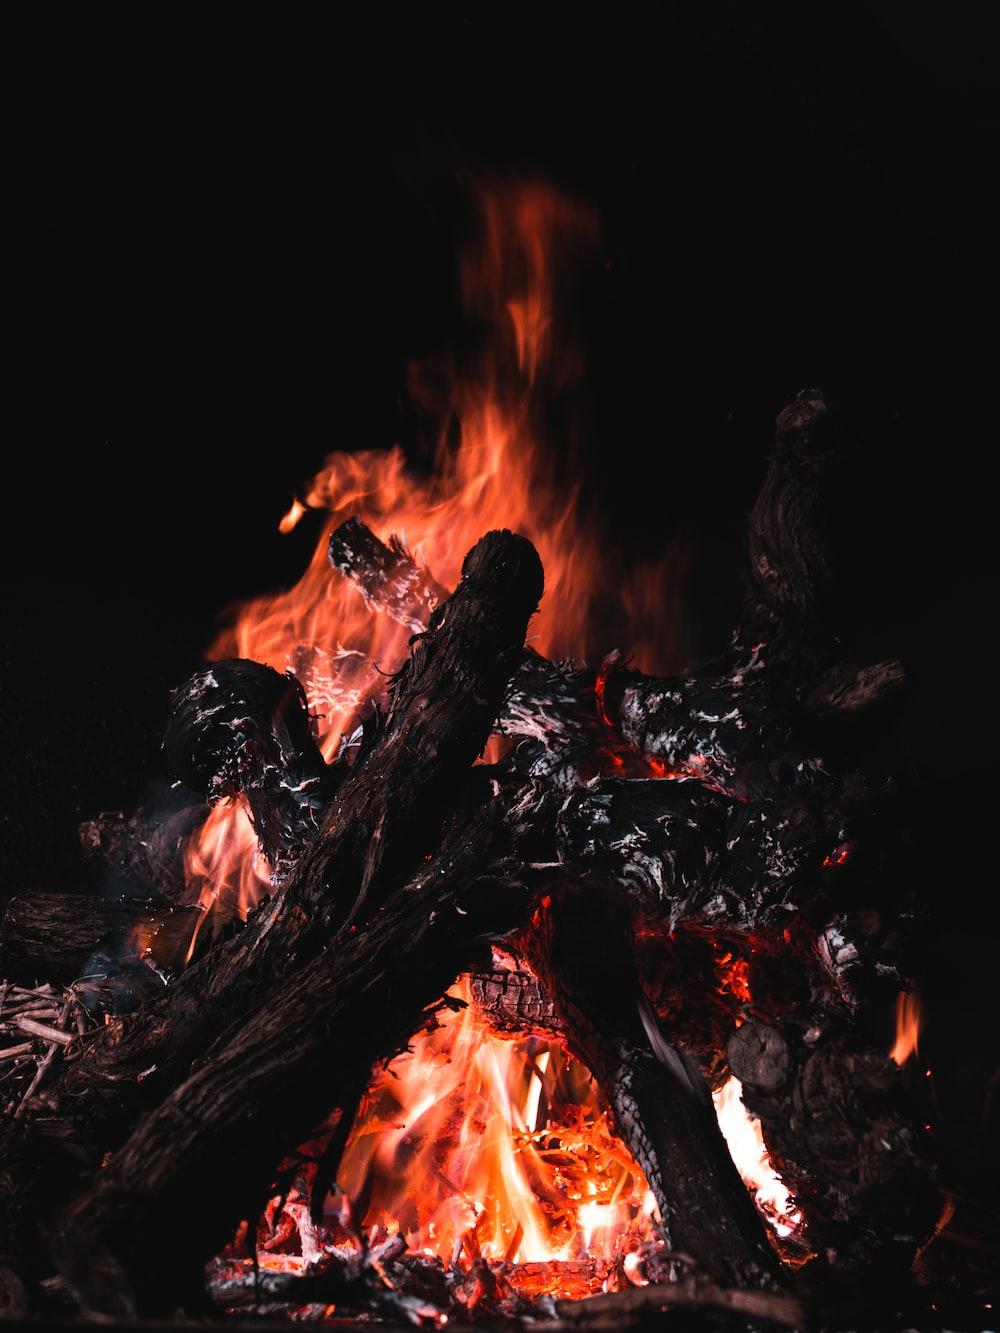 lit firewoods